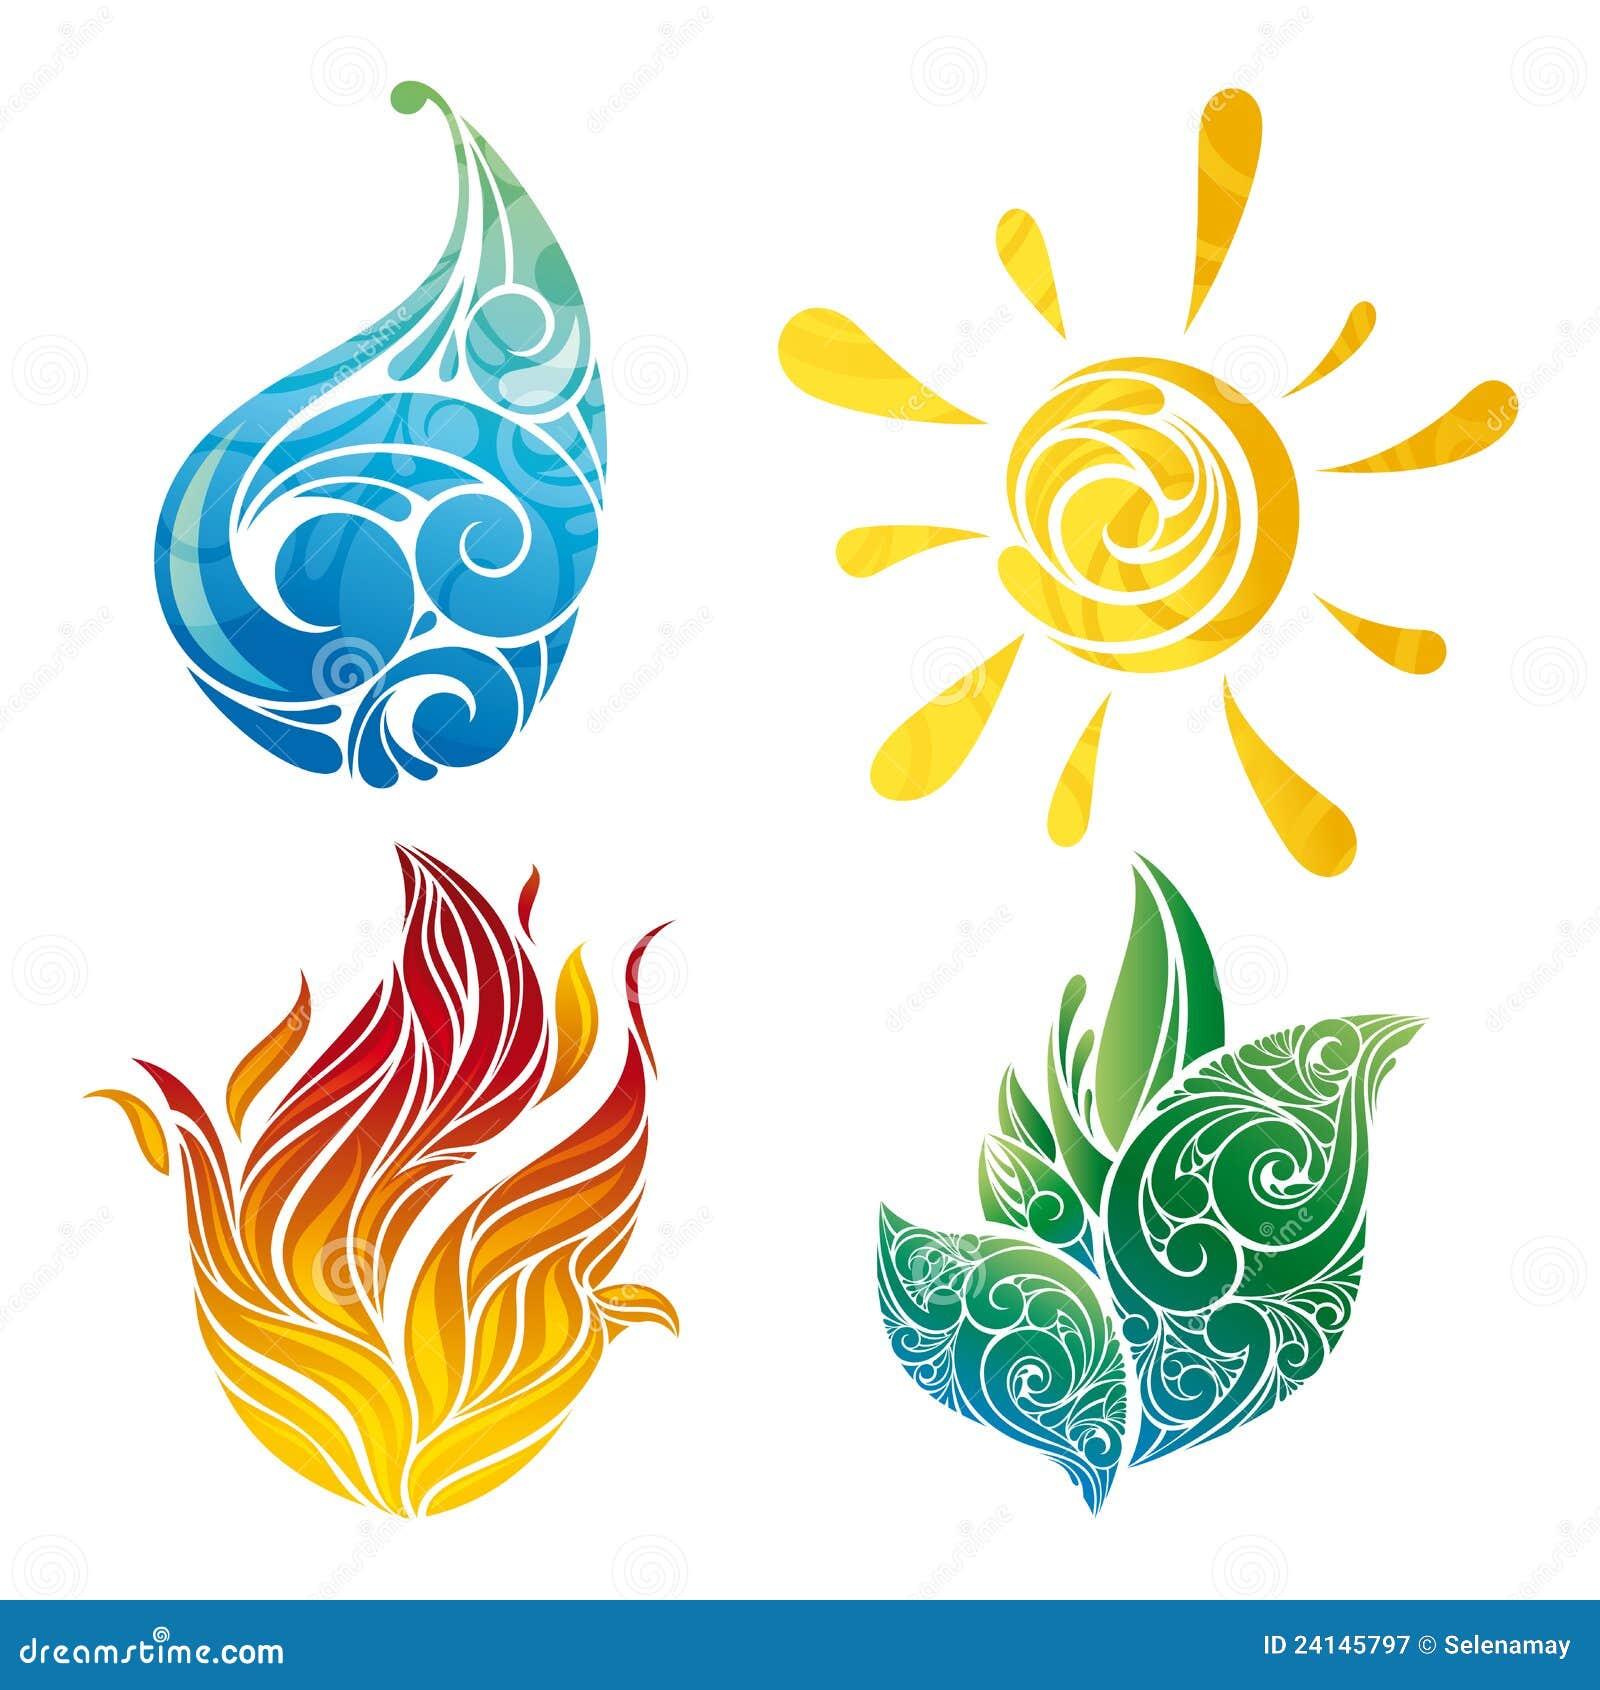 Vector Symbols Of Elements Stock Vector Illustration Of Element